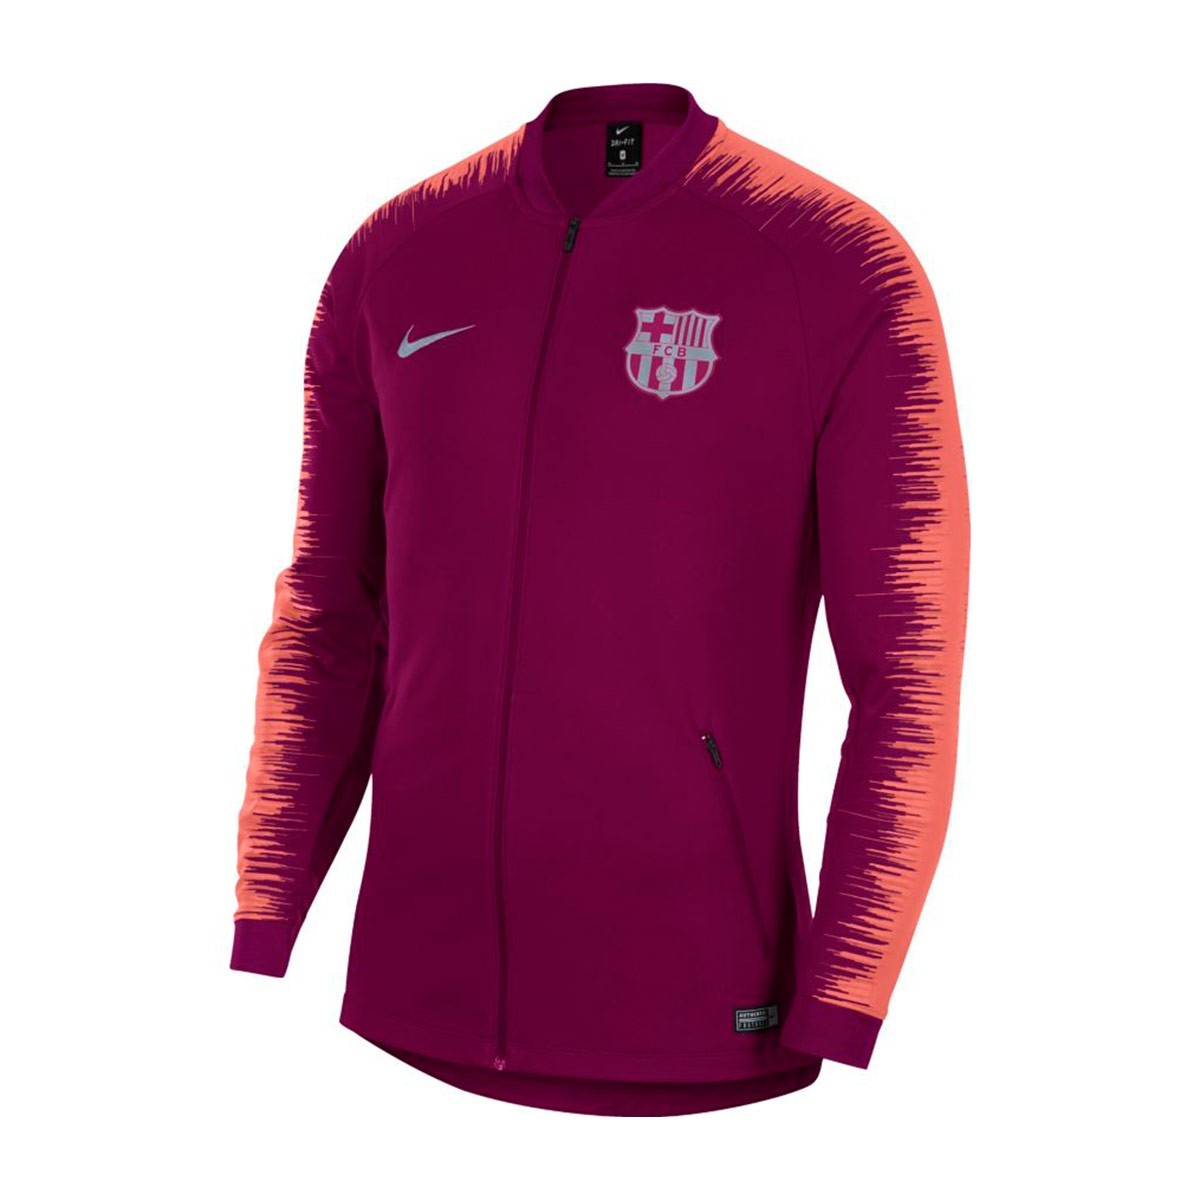 Nike FC Barcelona mikina   bunda bordová pánska 2018-2019 f6dd50ee871